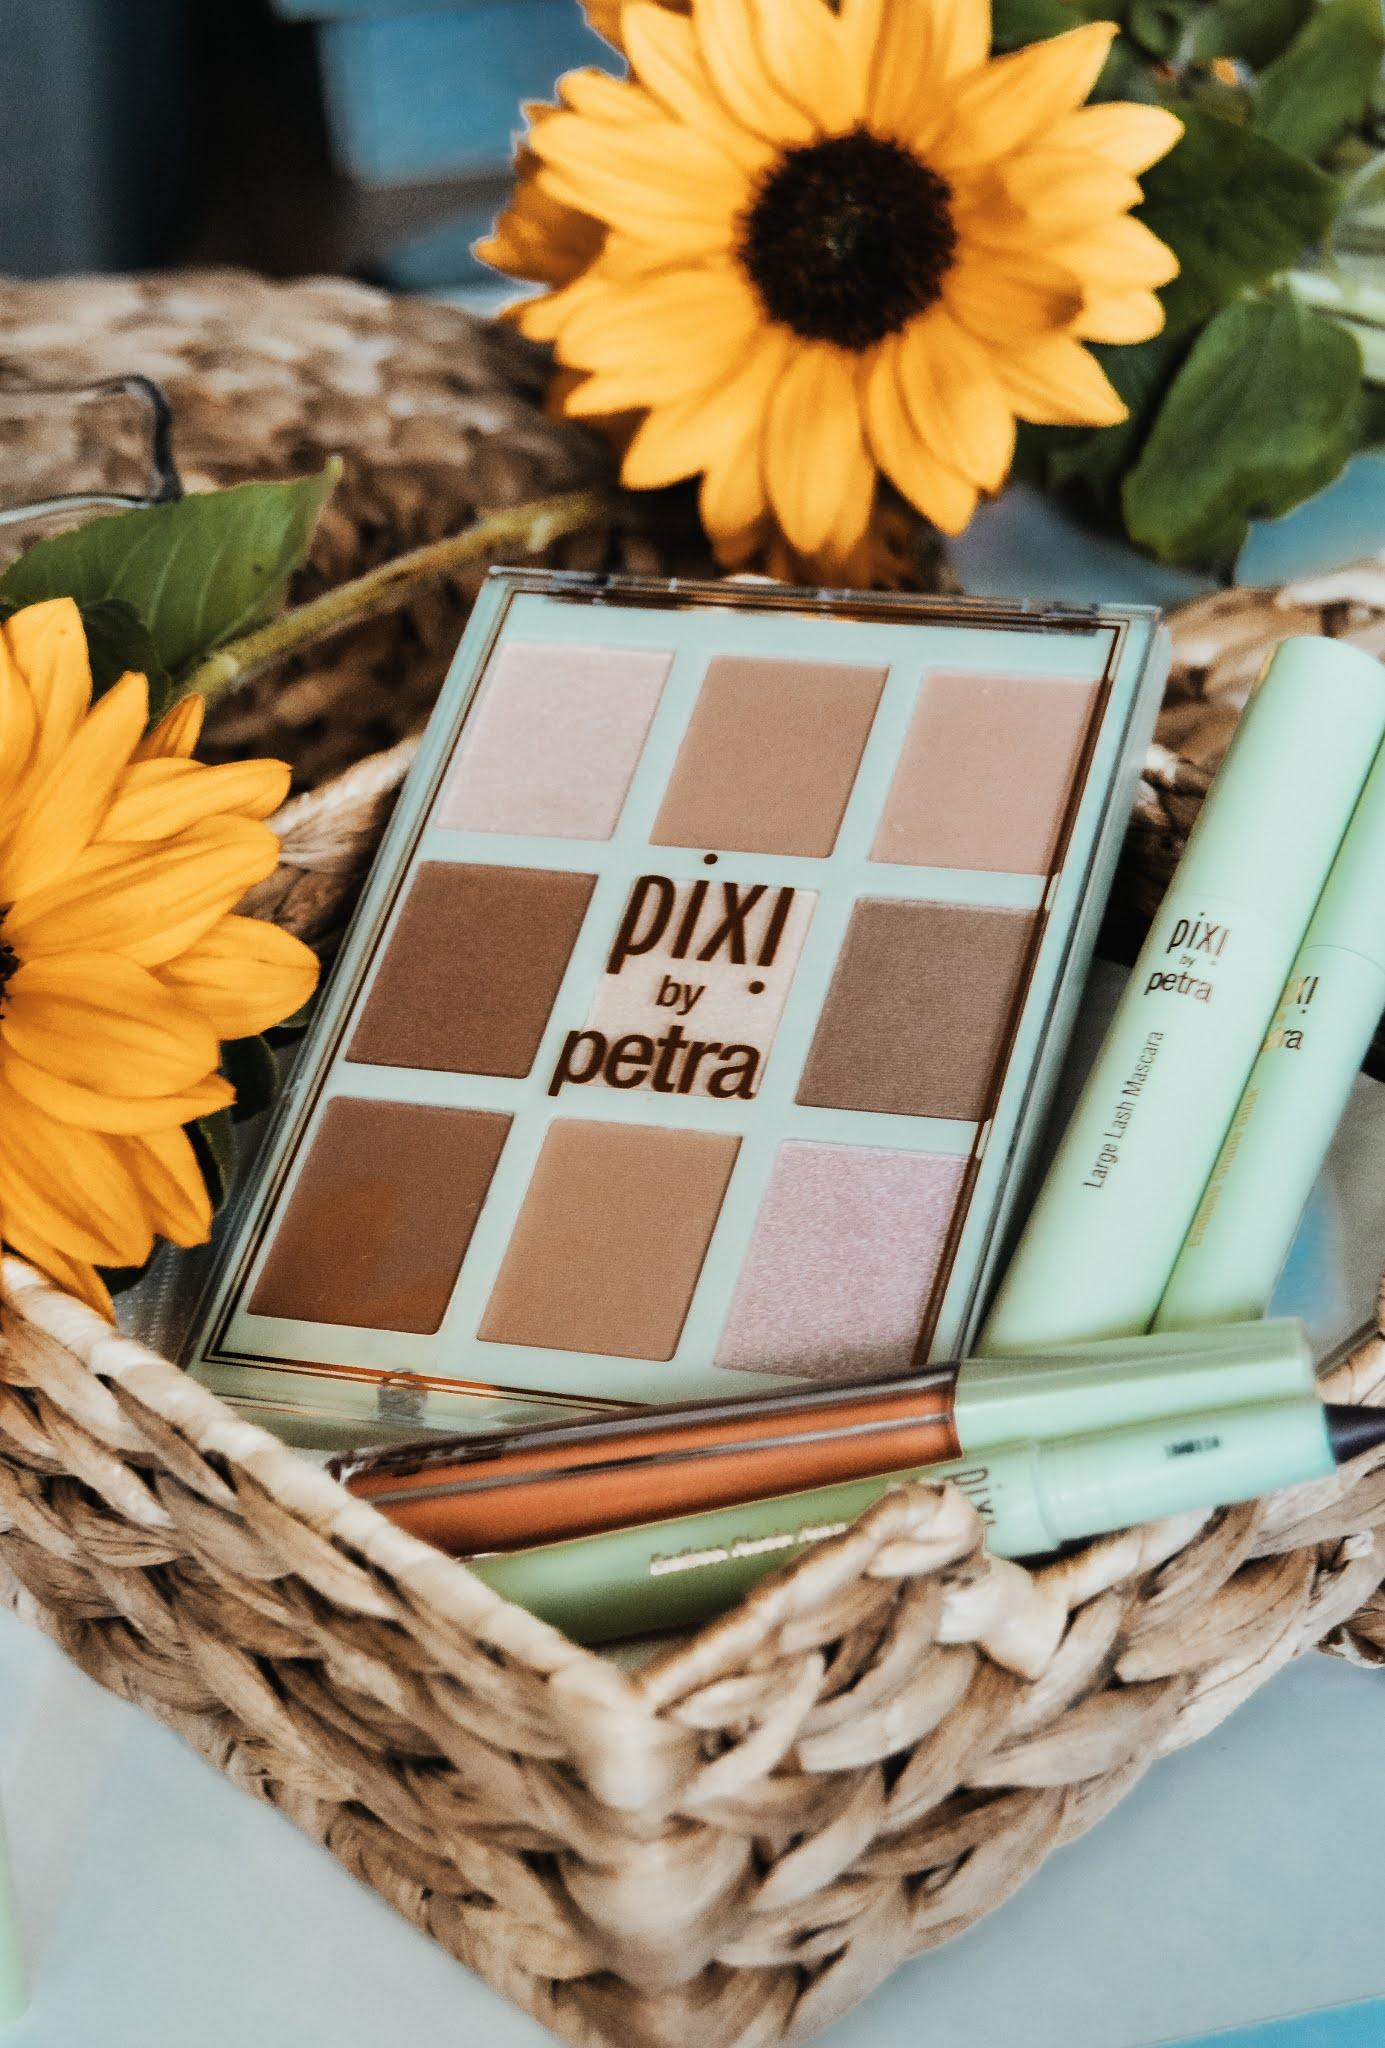 Pixi Beauty blogspot recenzja opinie